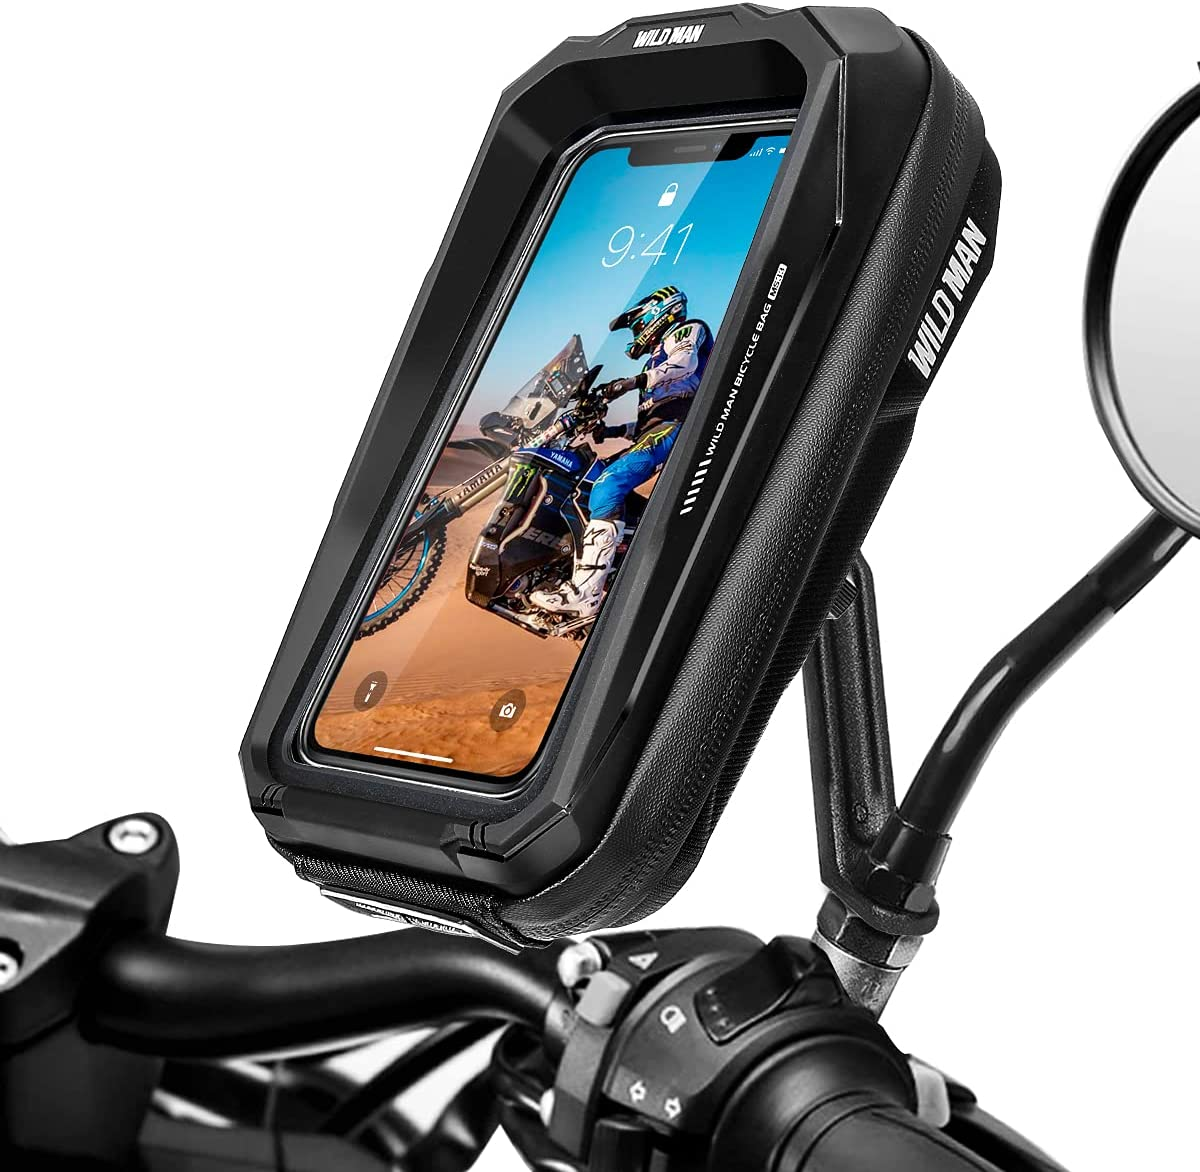 LUROON Soporte Movil Moto Impermeable 360°Rotación Anti Vibración Soporte Moto Aluminio Soporte Motocicleta Soporte Telefono Motocicleta Retrovisor para 3.5-6.7